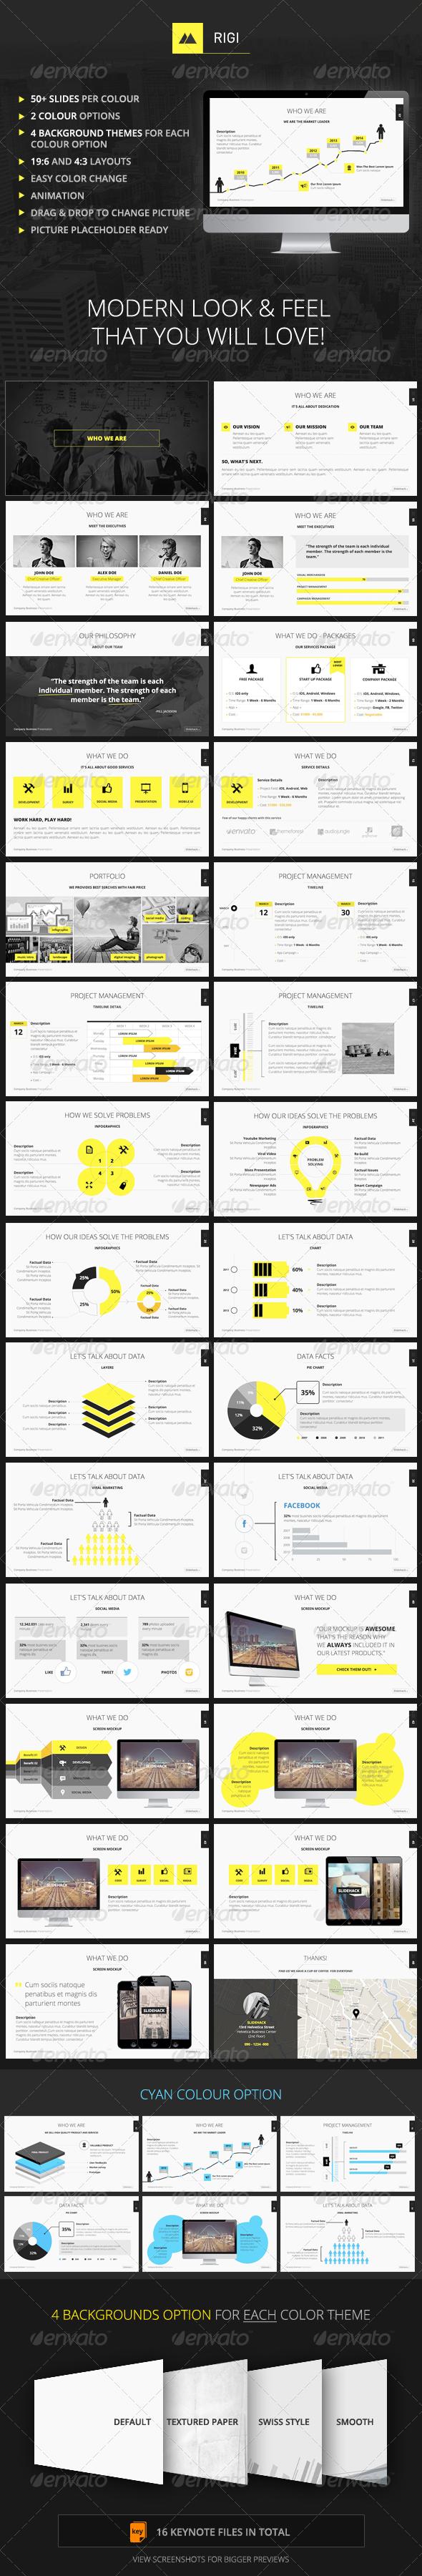 RIGI - Keynote Template - Keynote Templates Presentation Templates